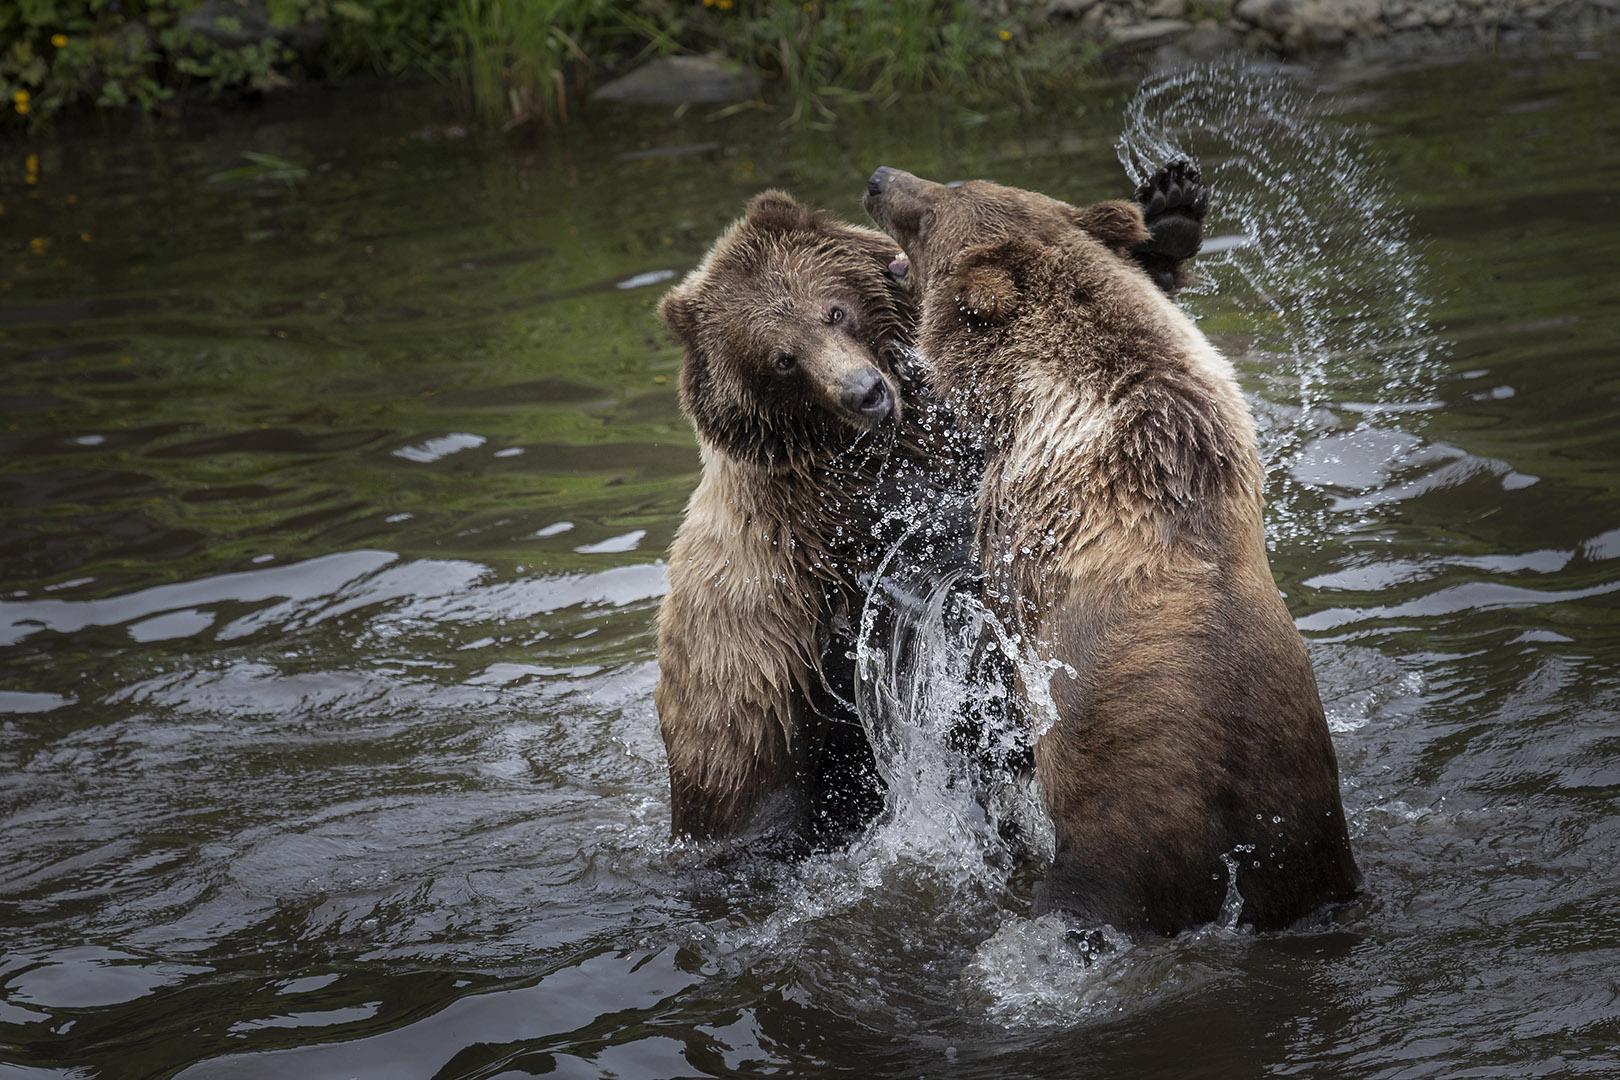 Linda Wiesner – Alaskan Brown Bears – HM